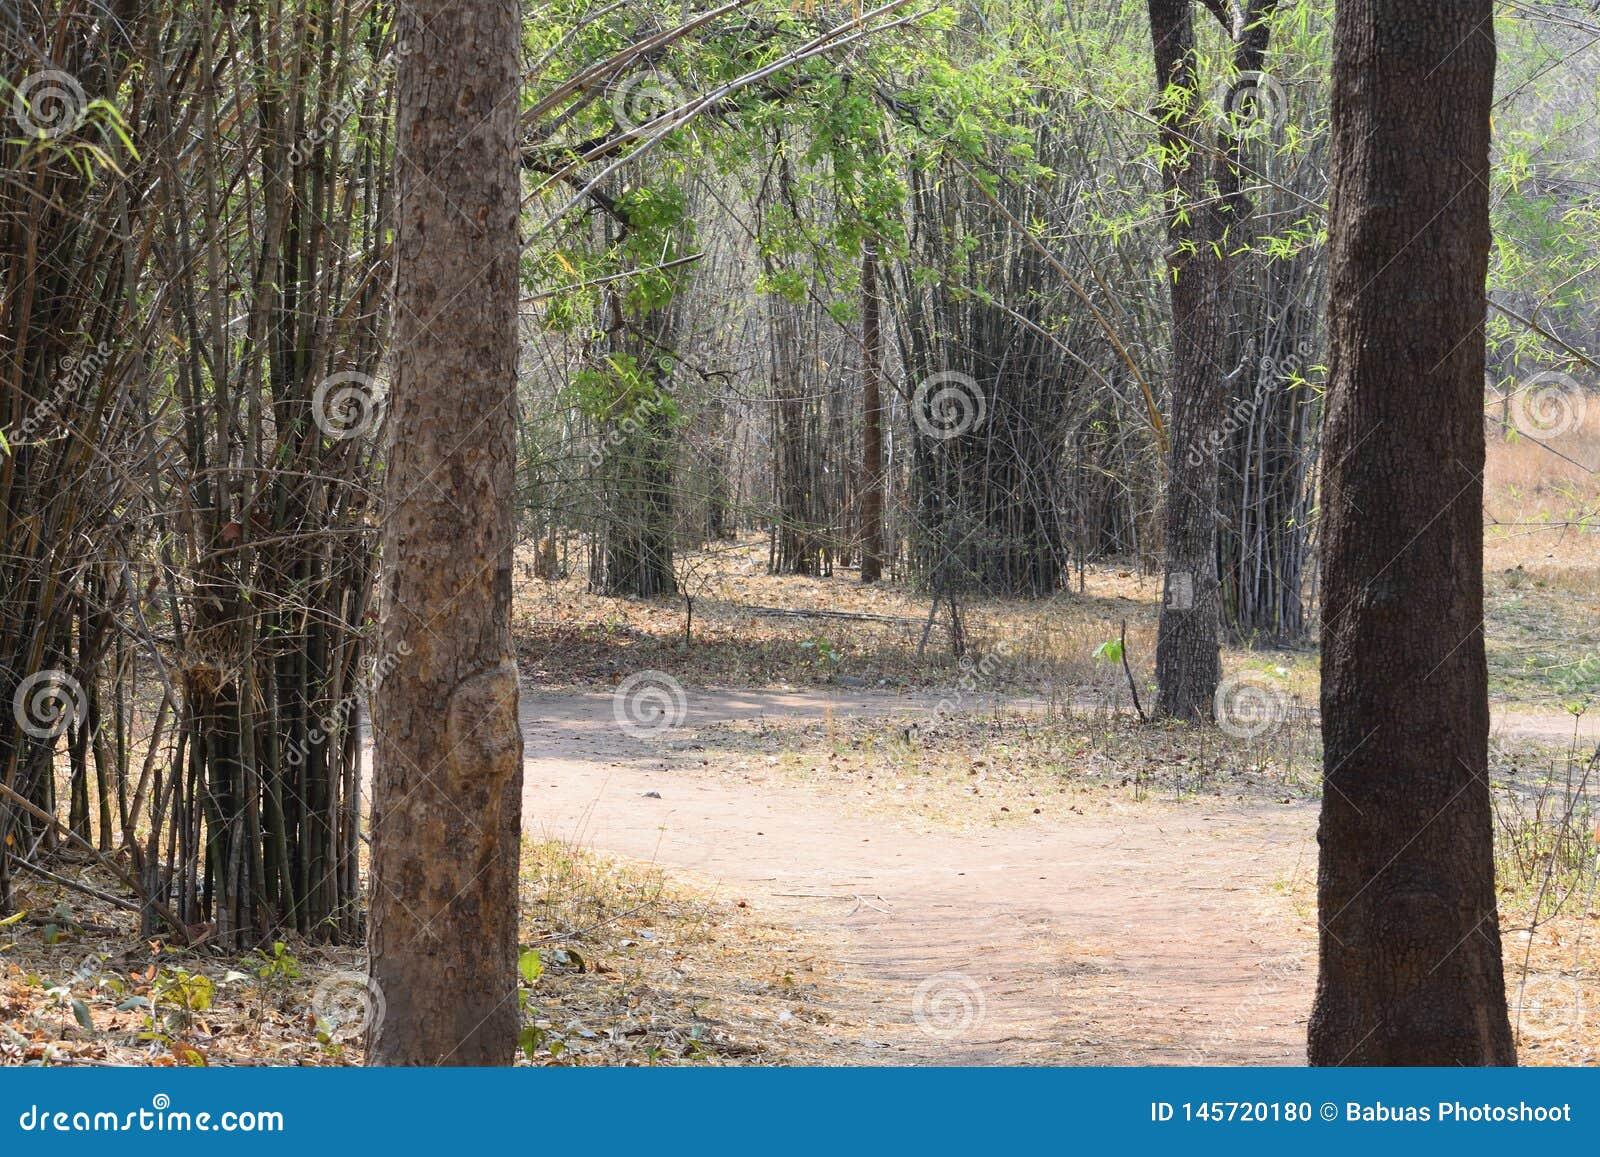 Forest pathway through Tadoba Wildlife Sanctuary in India